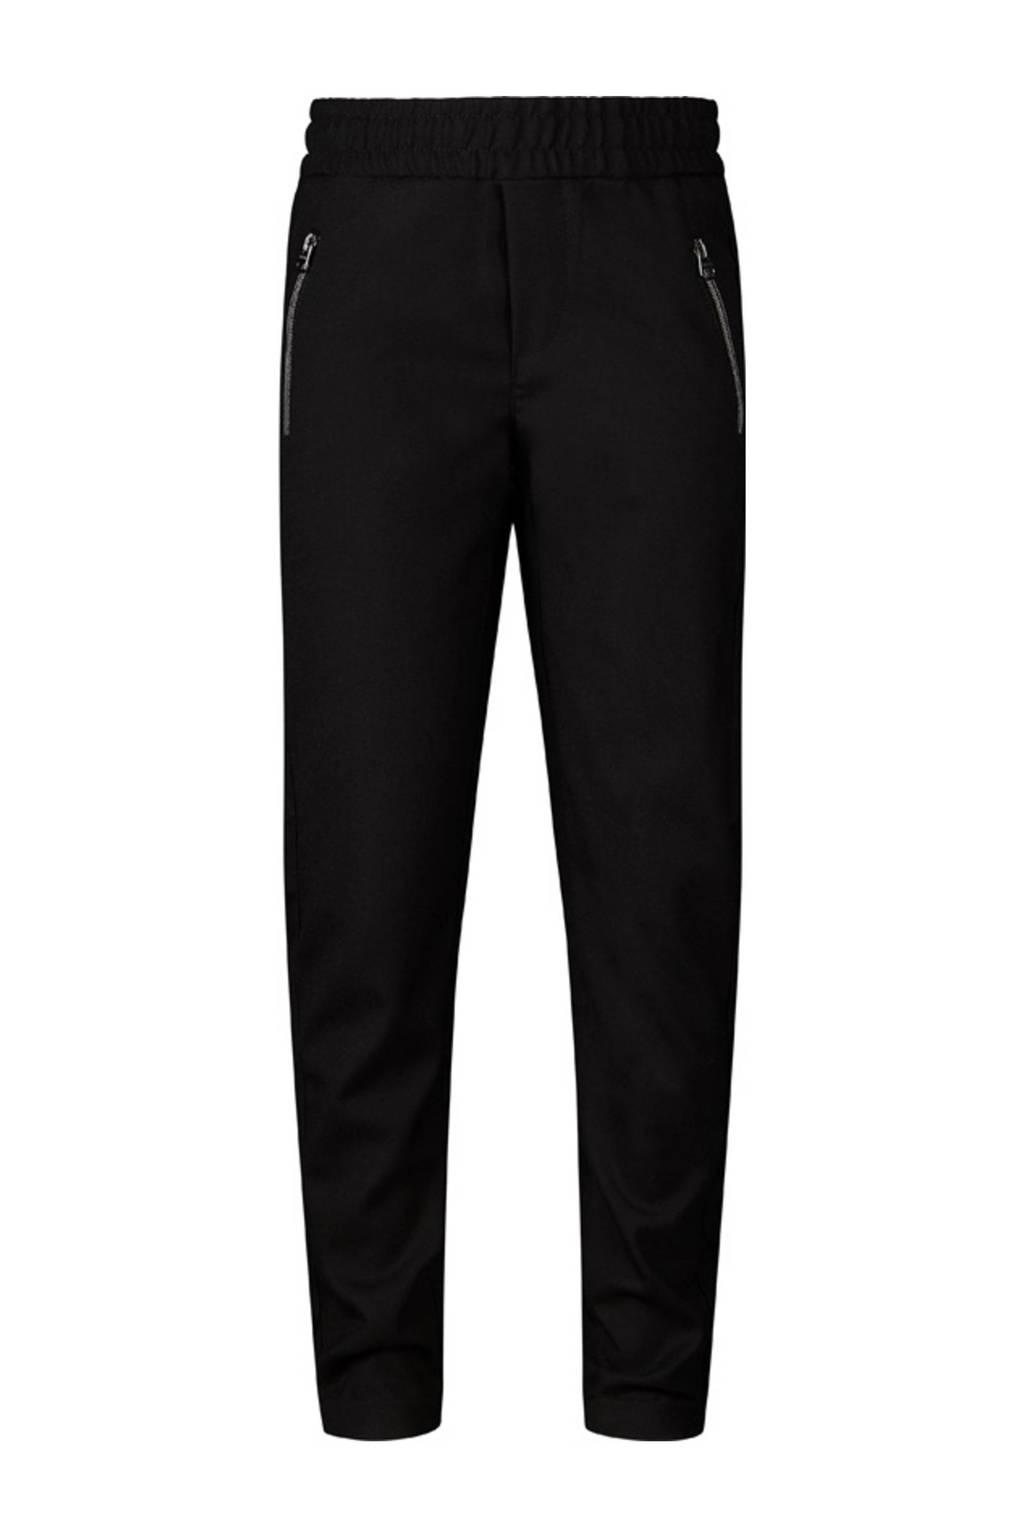 Retour Denim regular fit broek Hugo zwart, Zwart